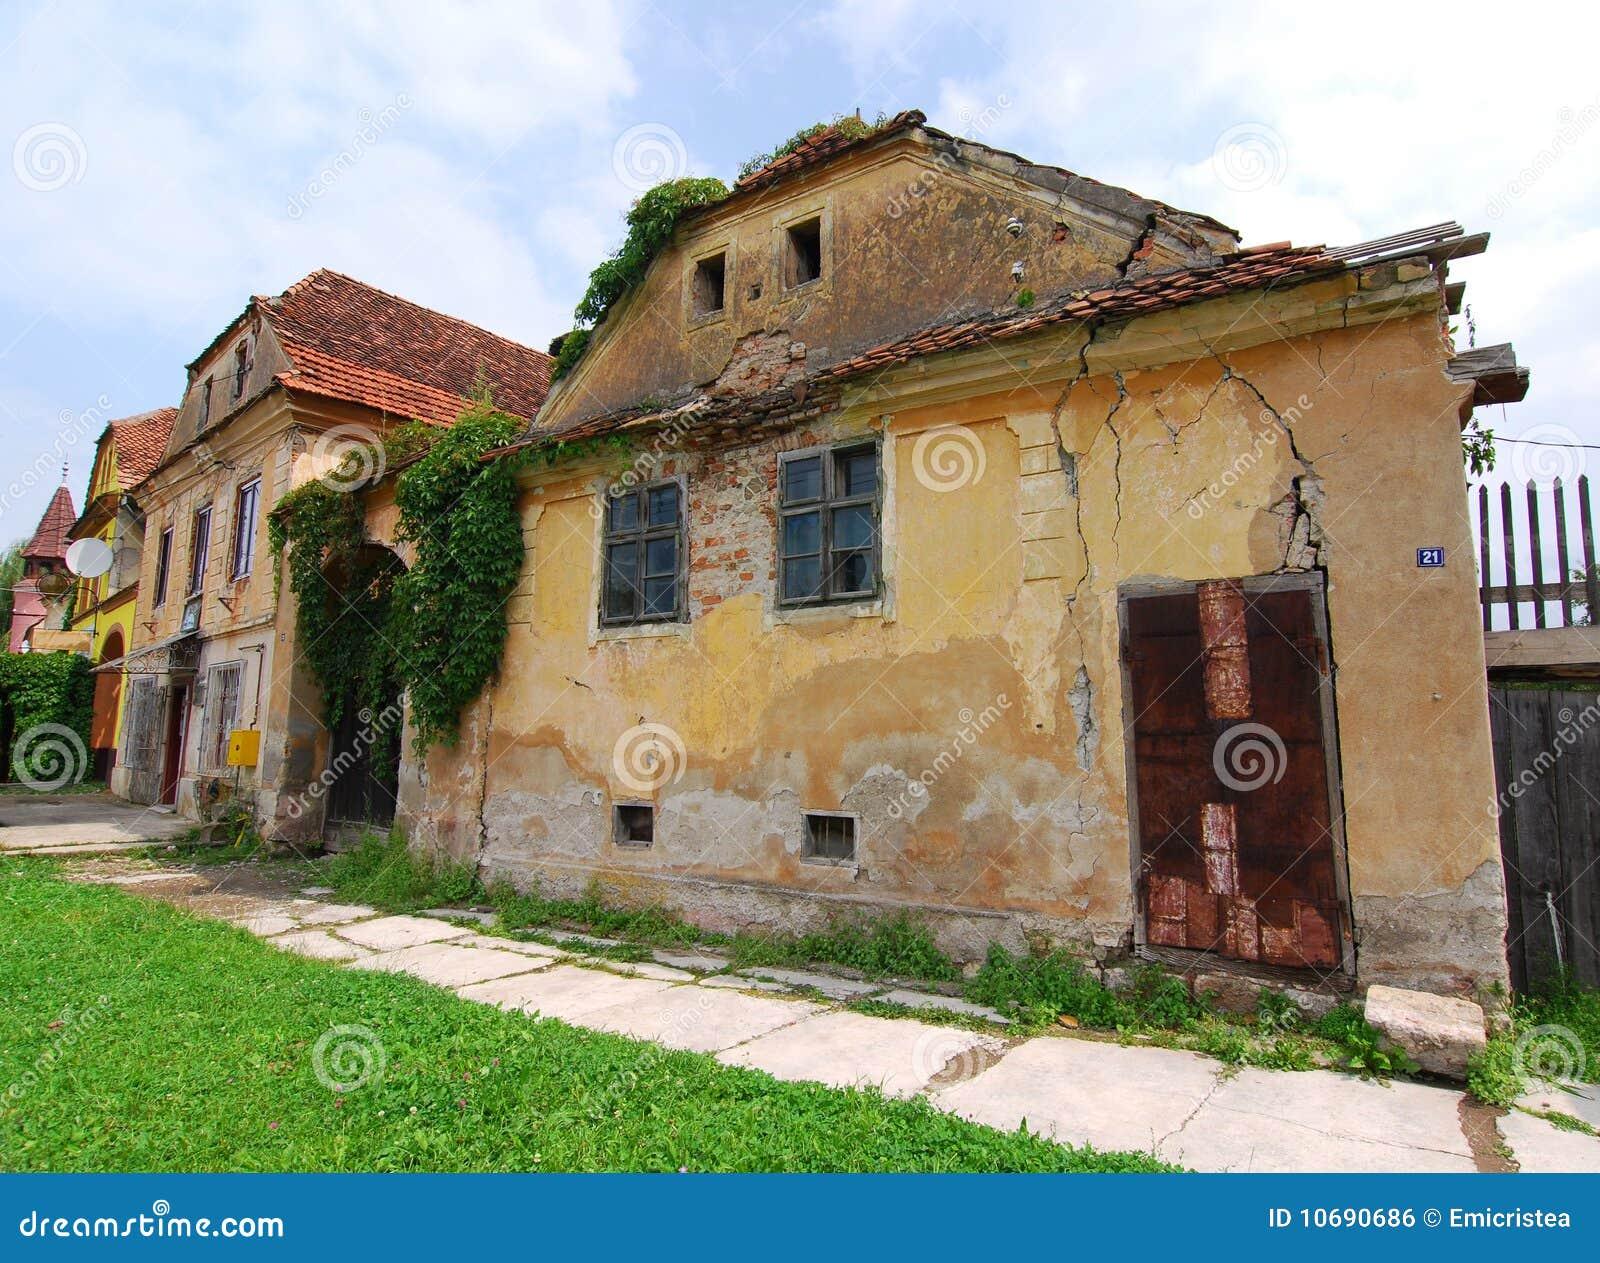 Old architecture in prejmer transylvania royalty free stock image image 10690686 - Saxon style houses in transylvania ...